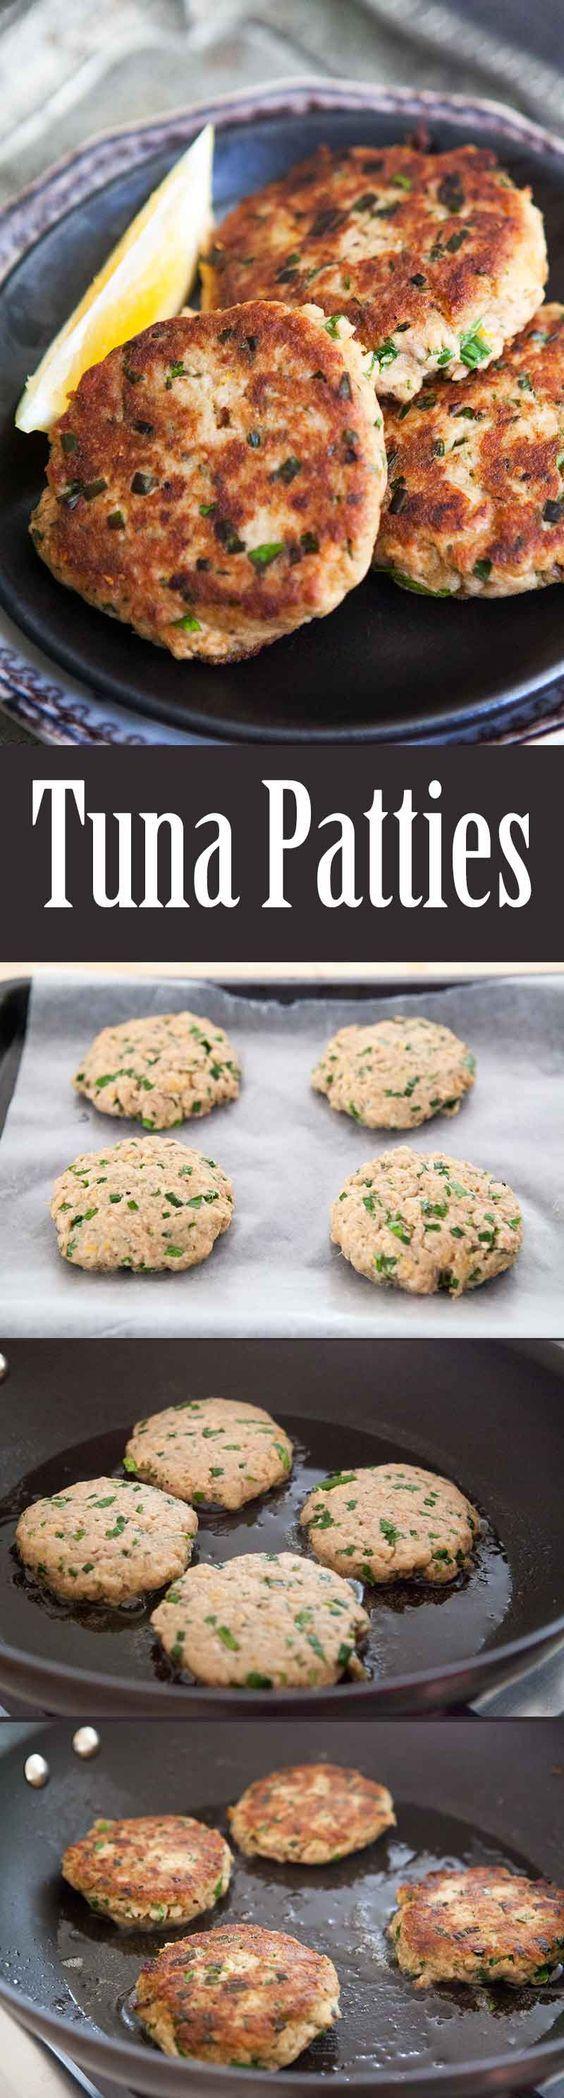 1000 ideas about tuna patties on pinterest tuna tuna for Tuna fish patties